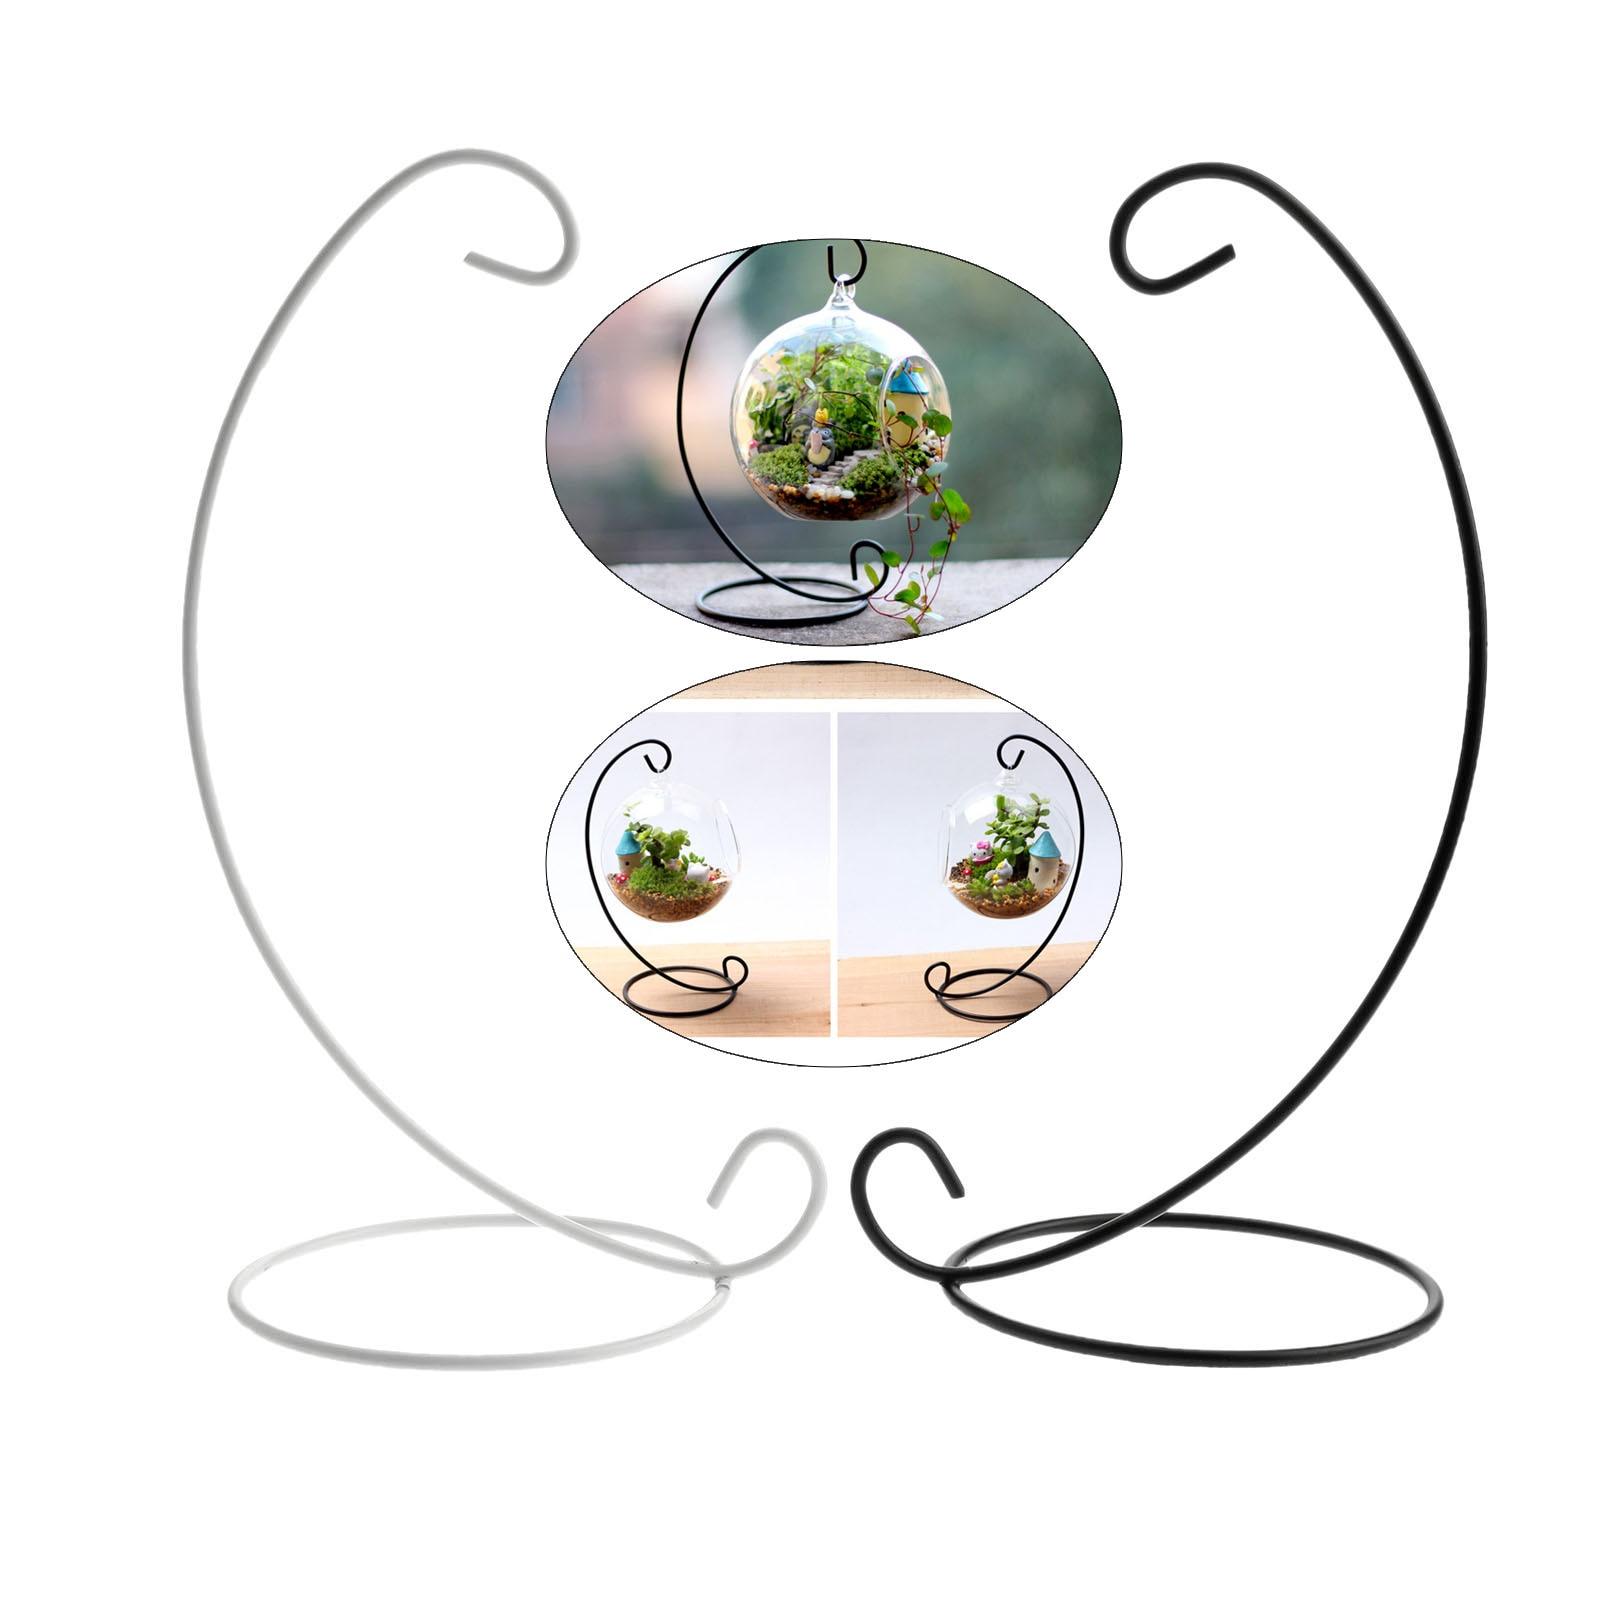 dophee 2017 1pc Κομψό σίδερο Γάμος Holder Holder - Διακόσμηση σπιτιού - Φωτογραφία 4